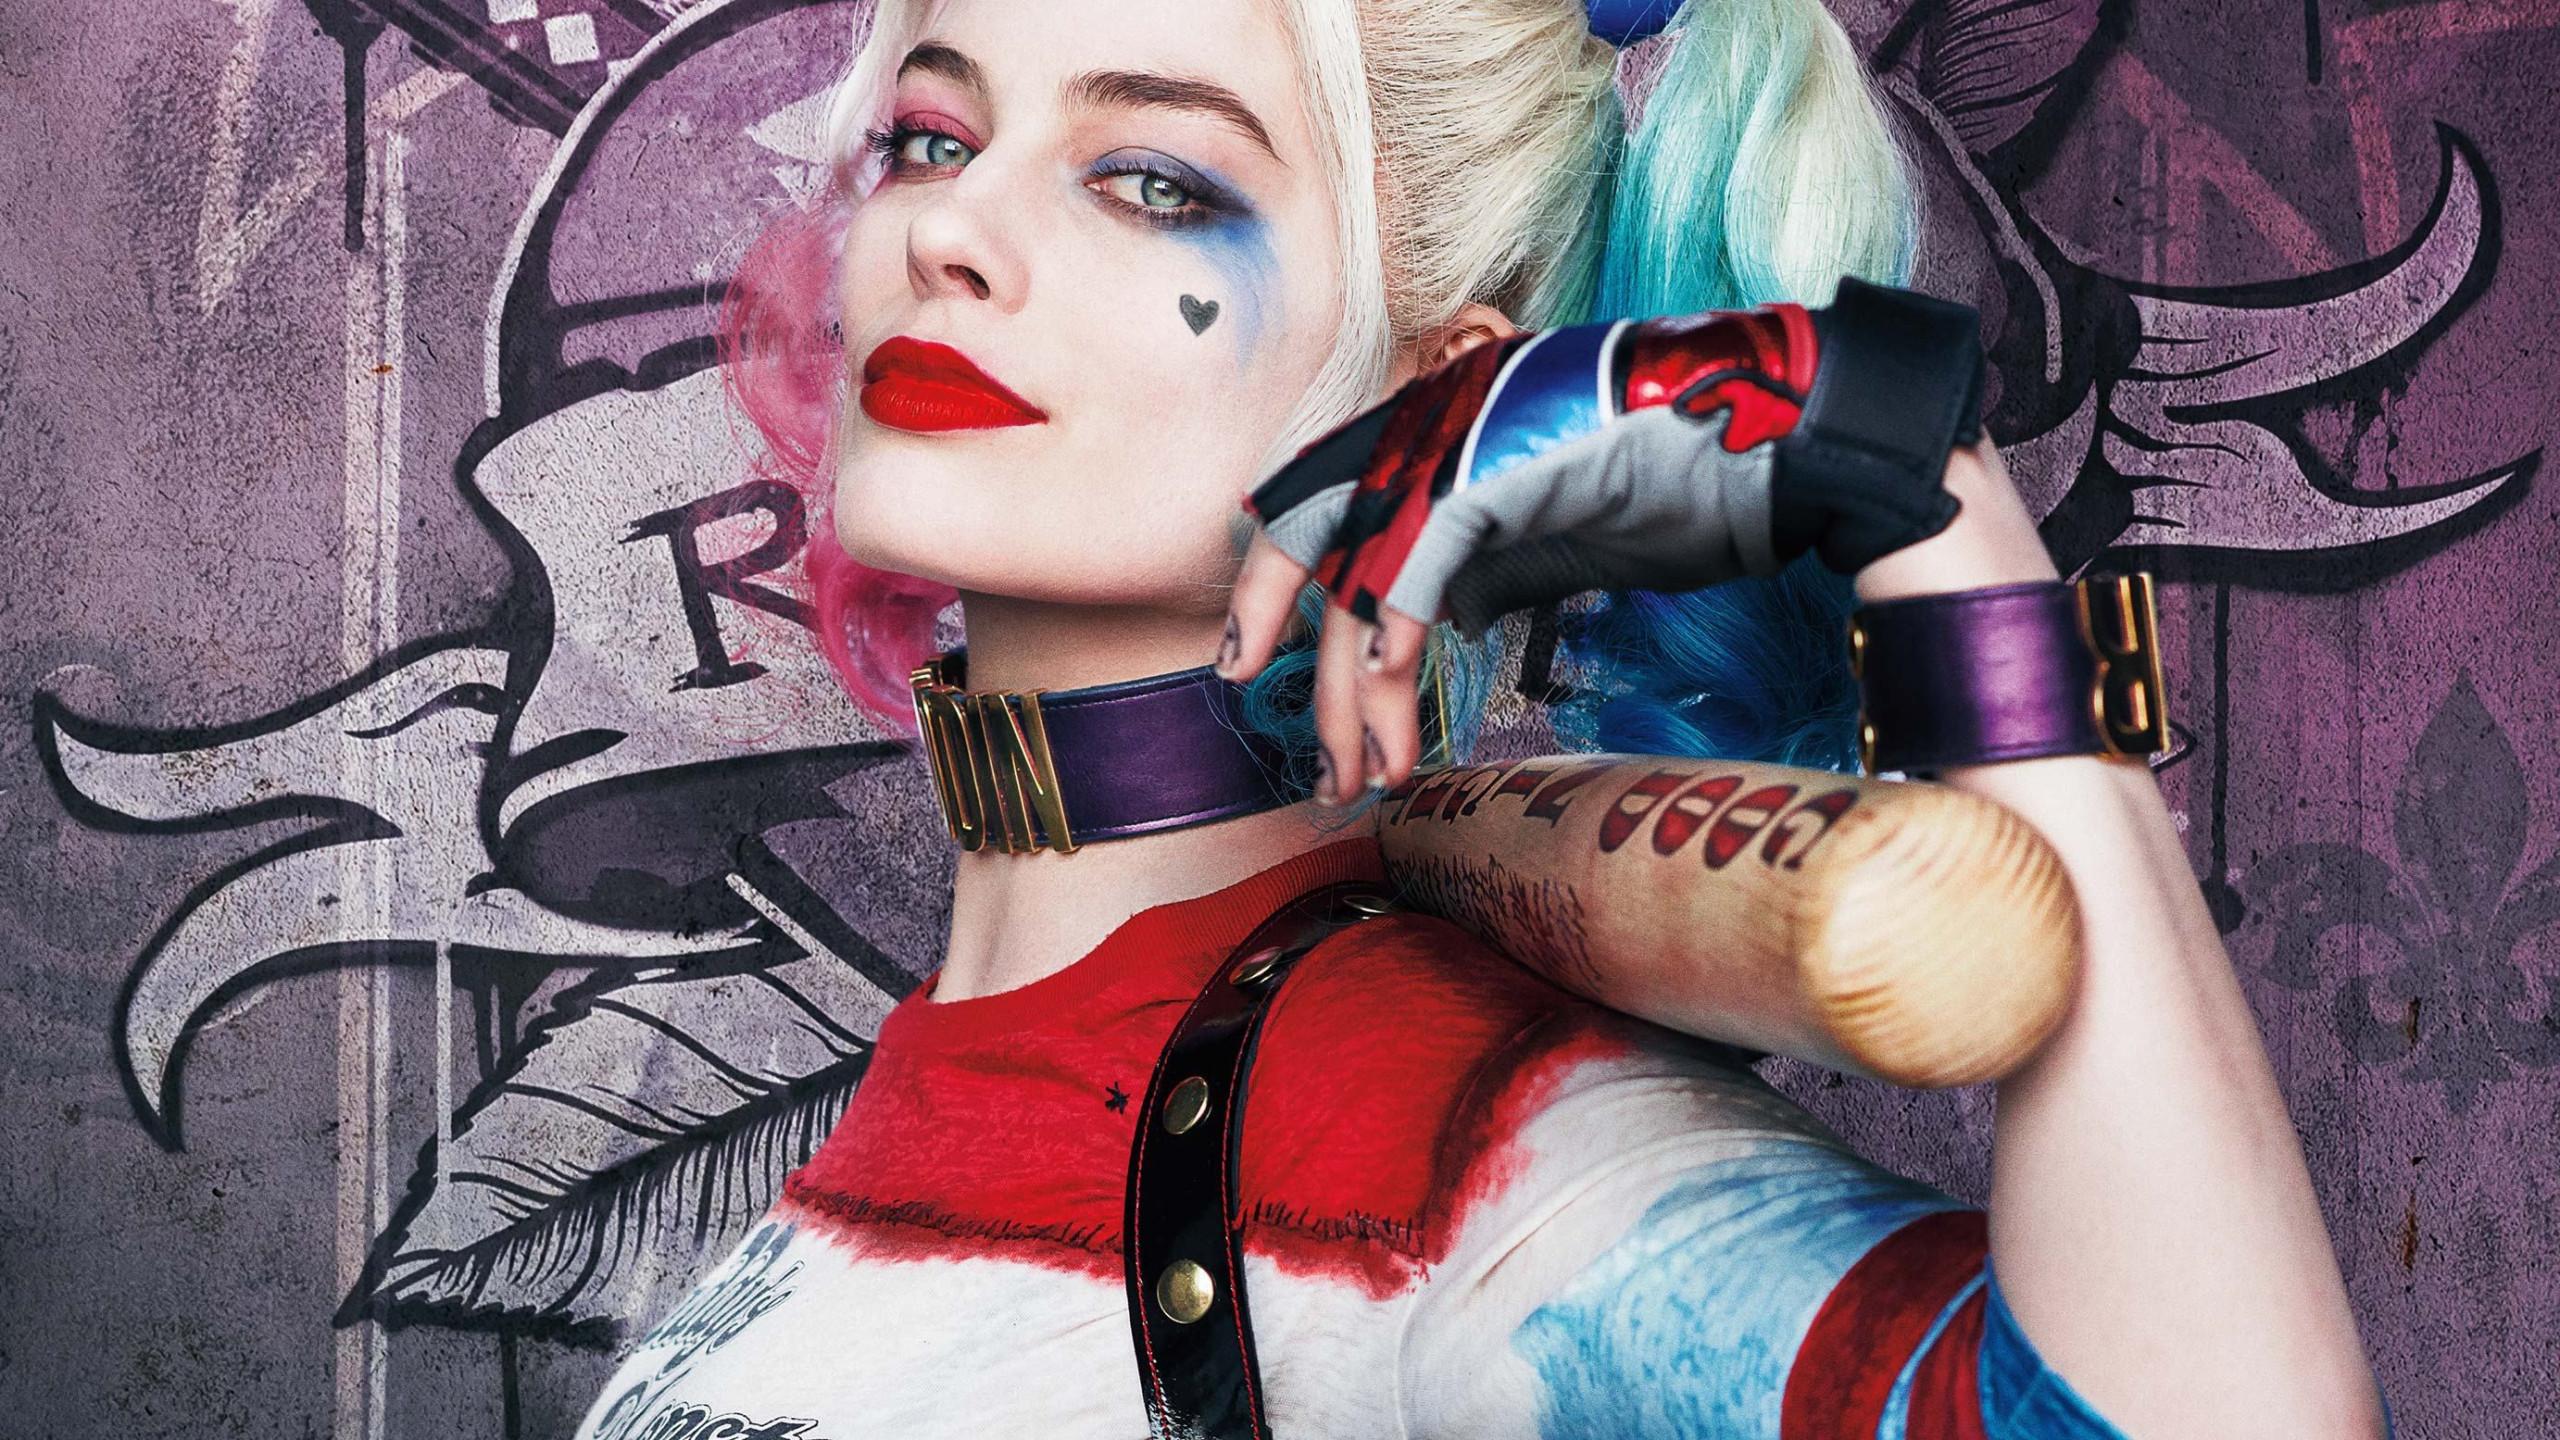 Harley Quinn Wallpaper 4 Download Free Desktop Wallpapers